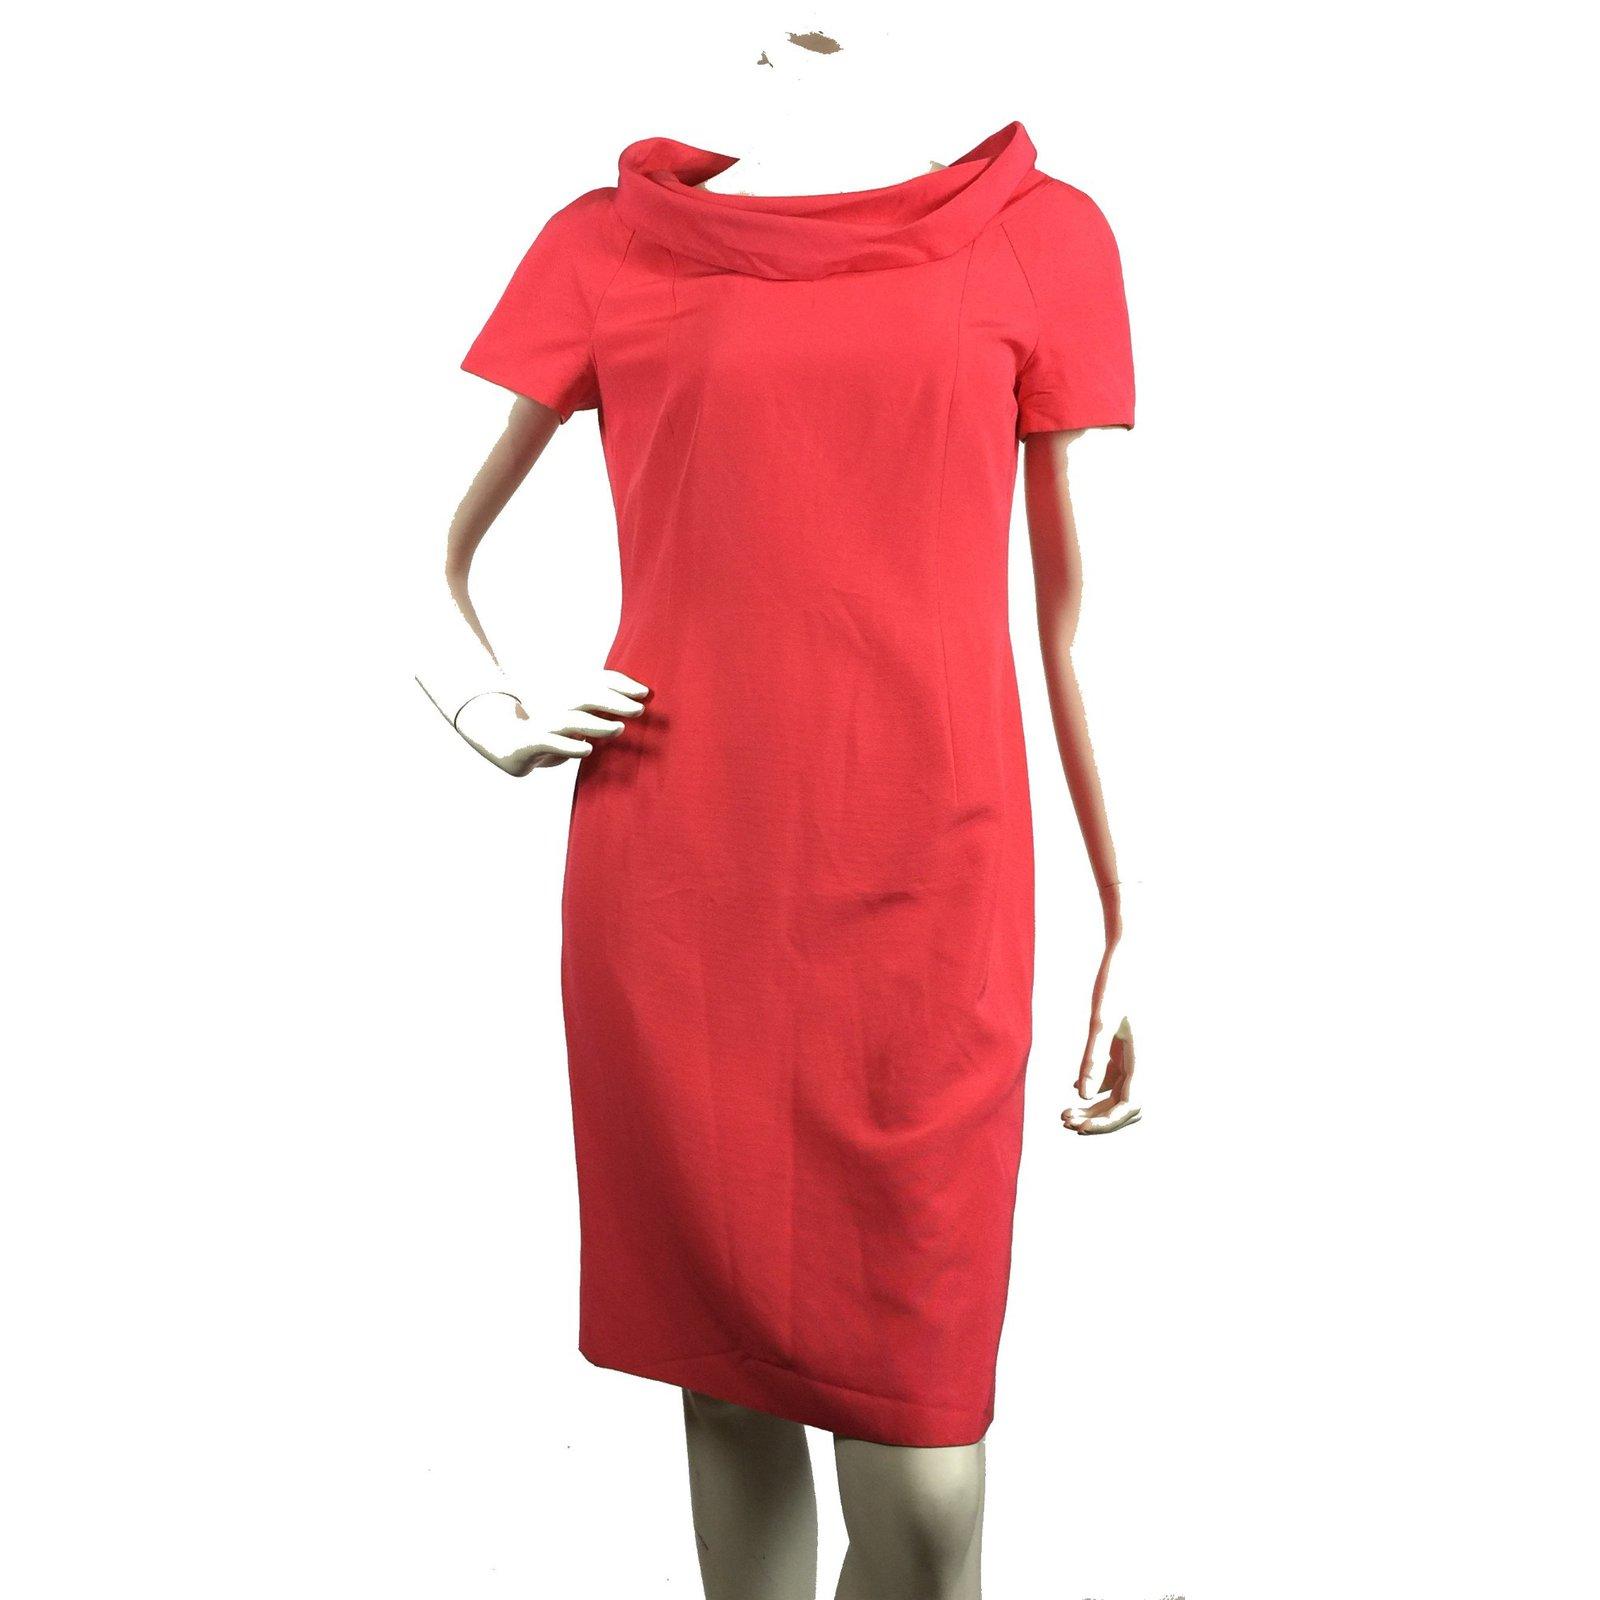 escada-cotton-coral-red-dress.jpg